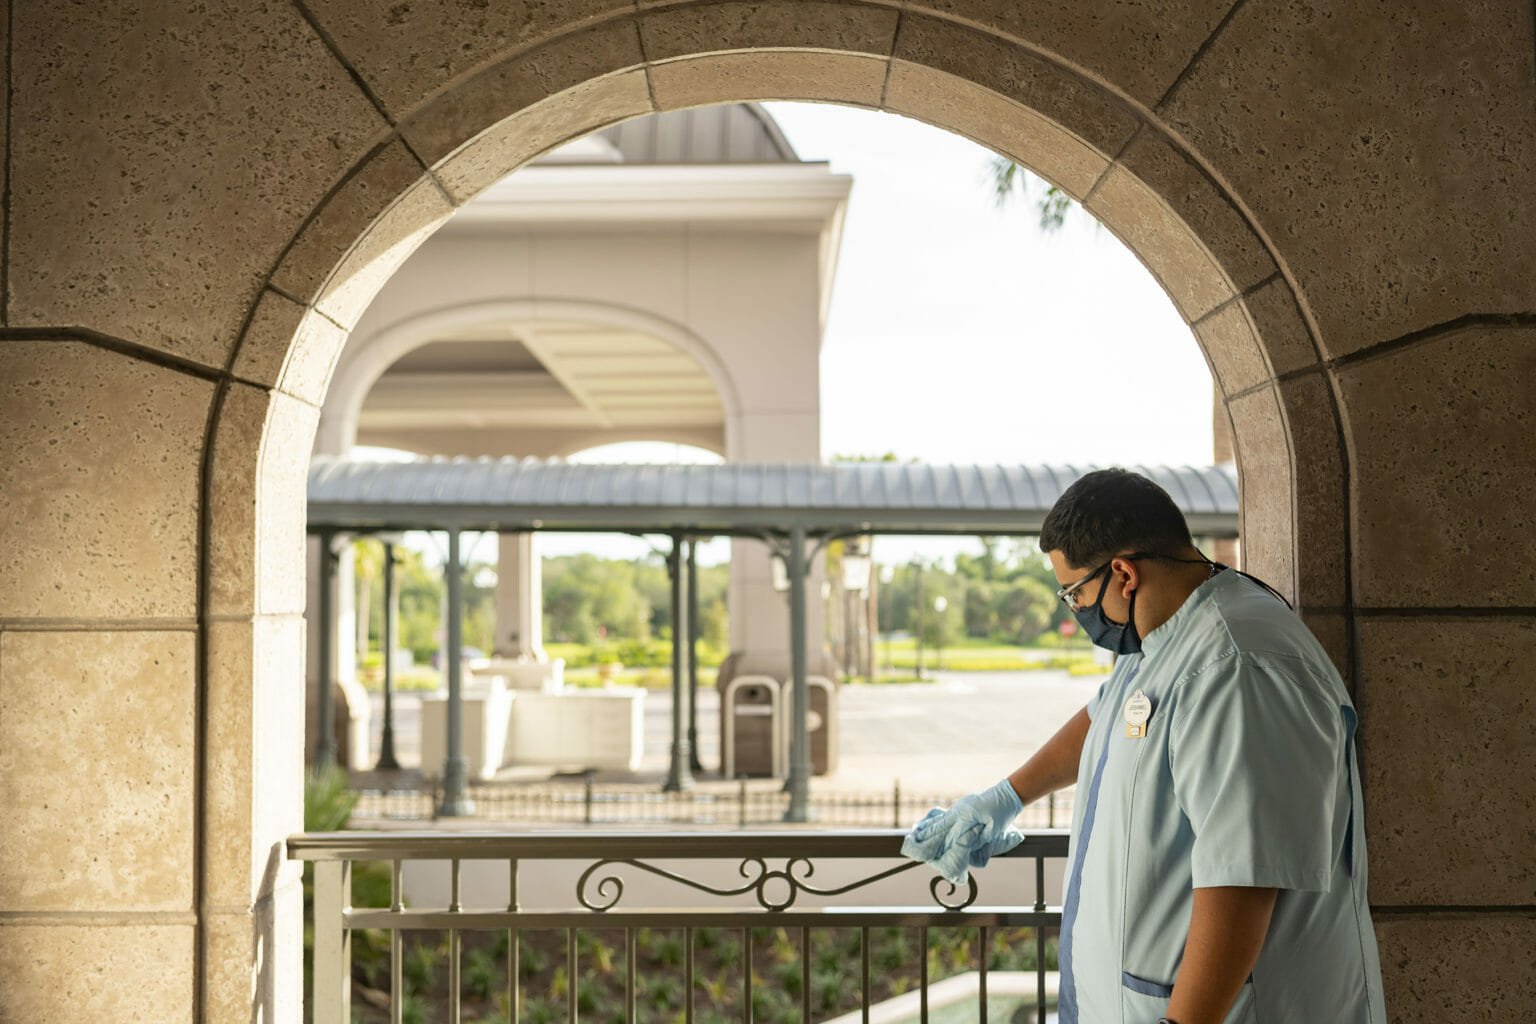 Walt Disney World's New Hotel Cleaning Procedures